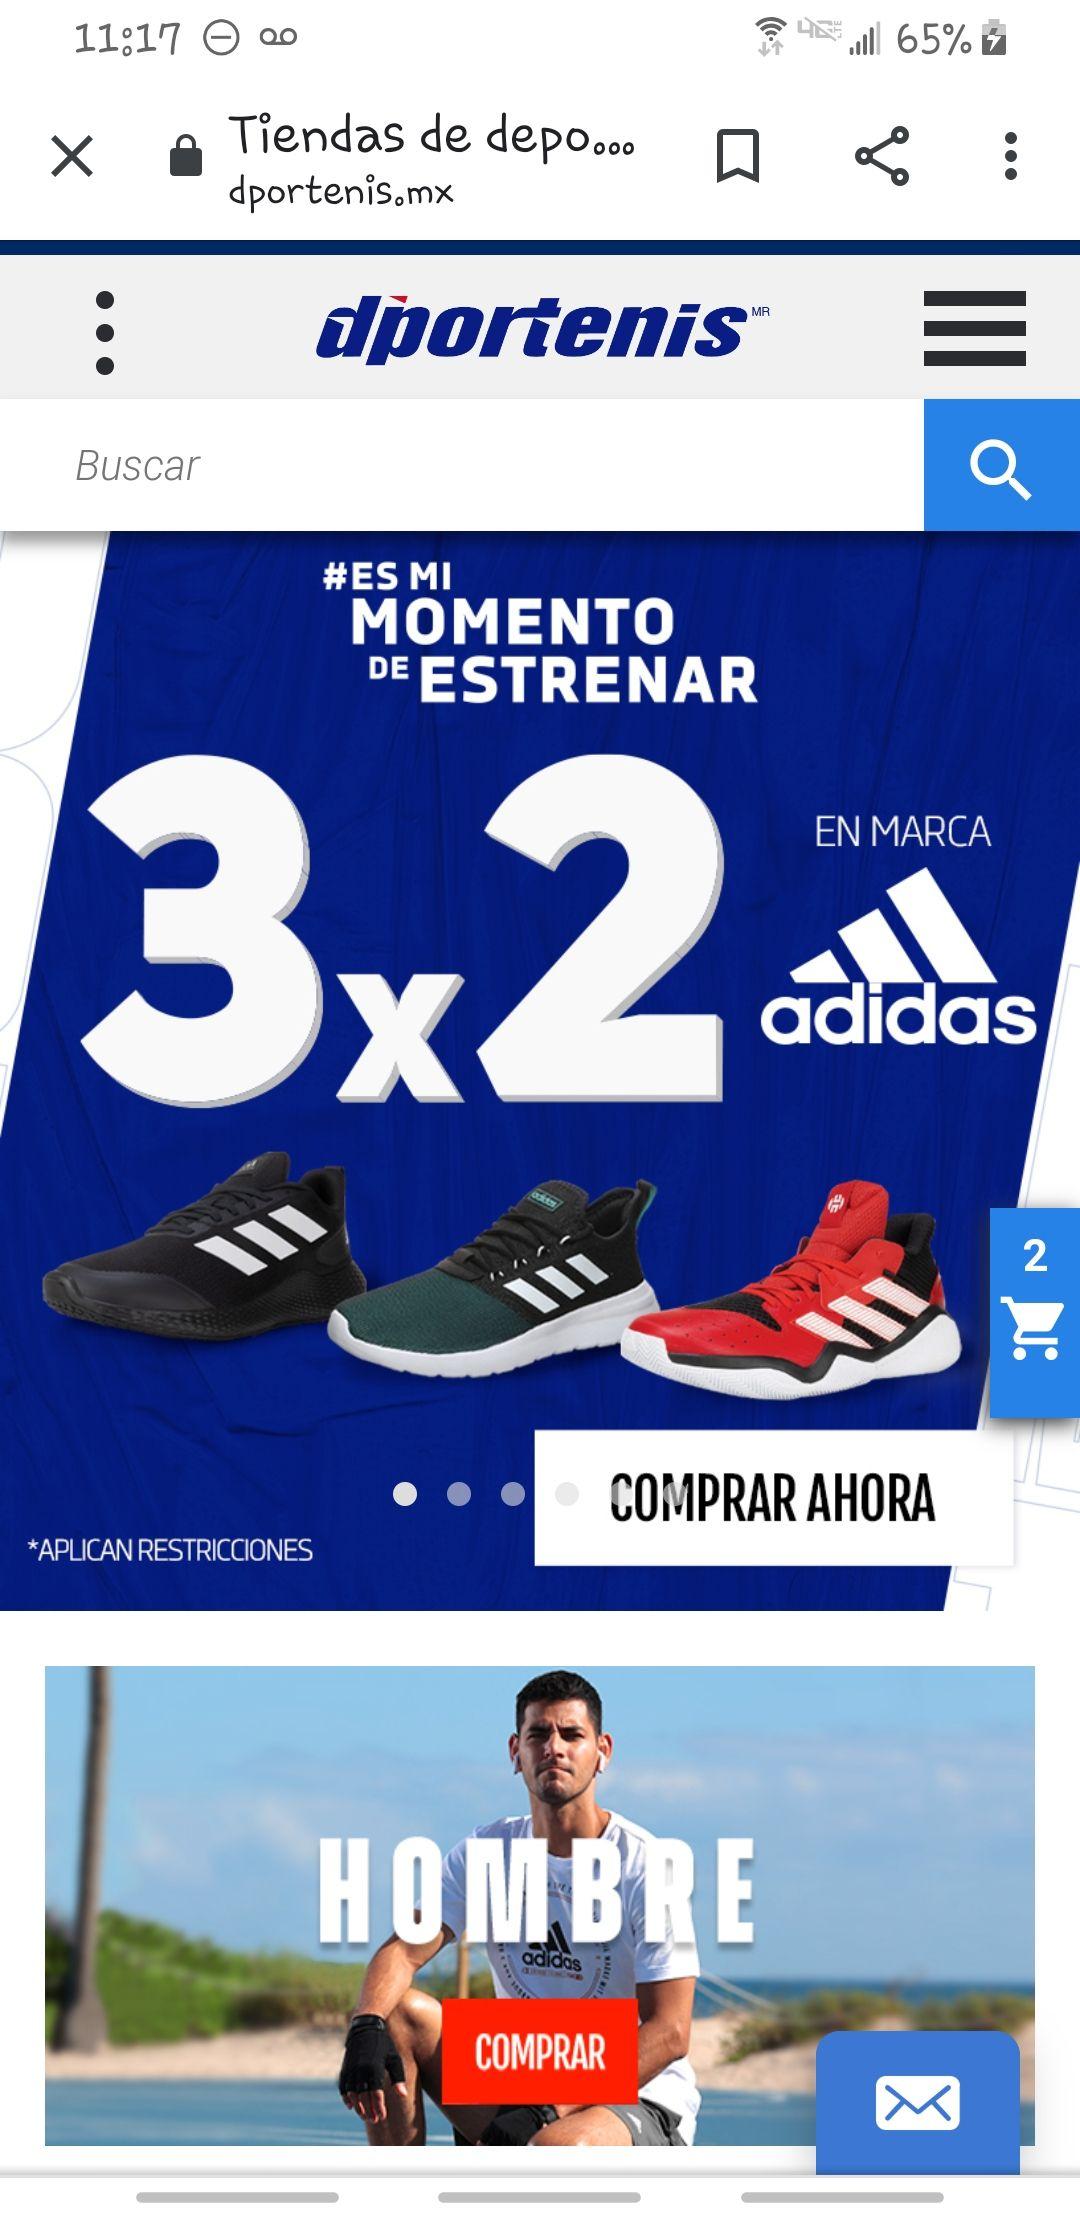 Dportenis: Marca Adidas 3X2